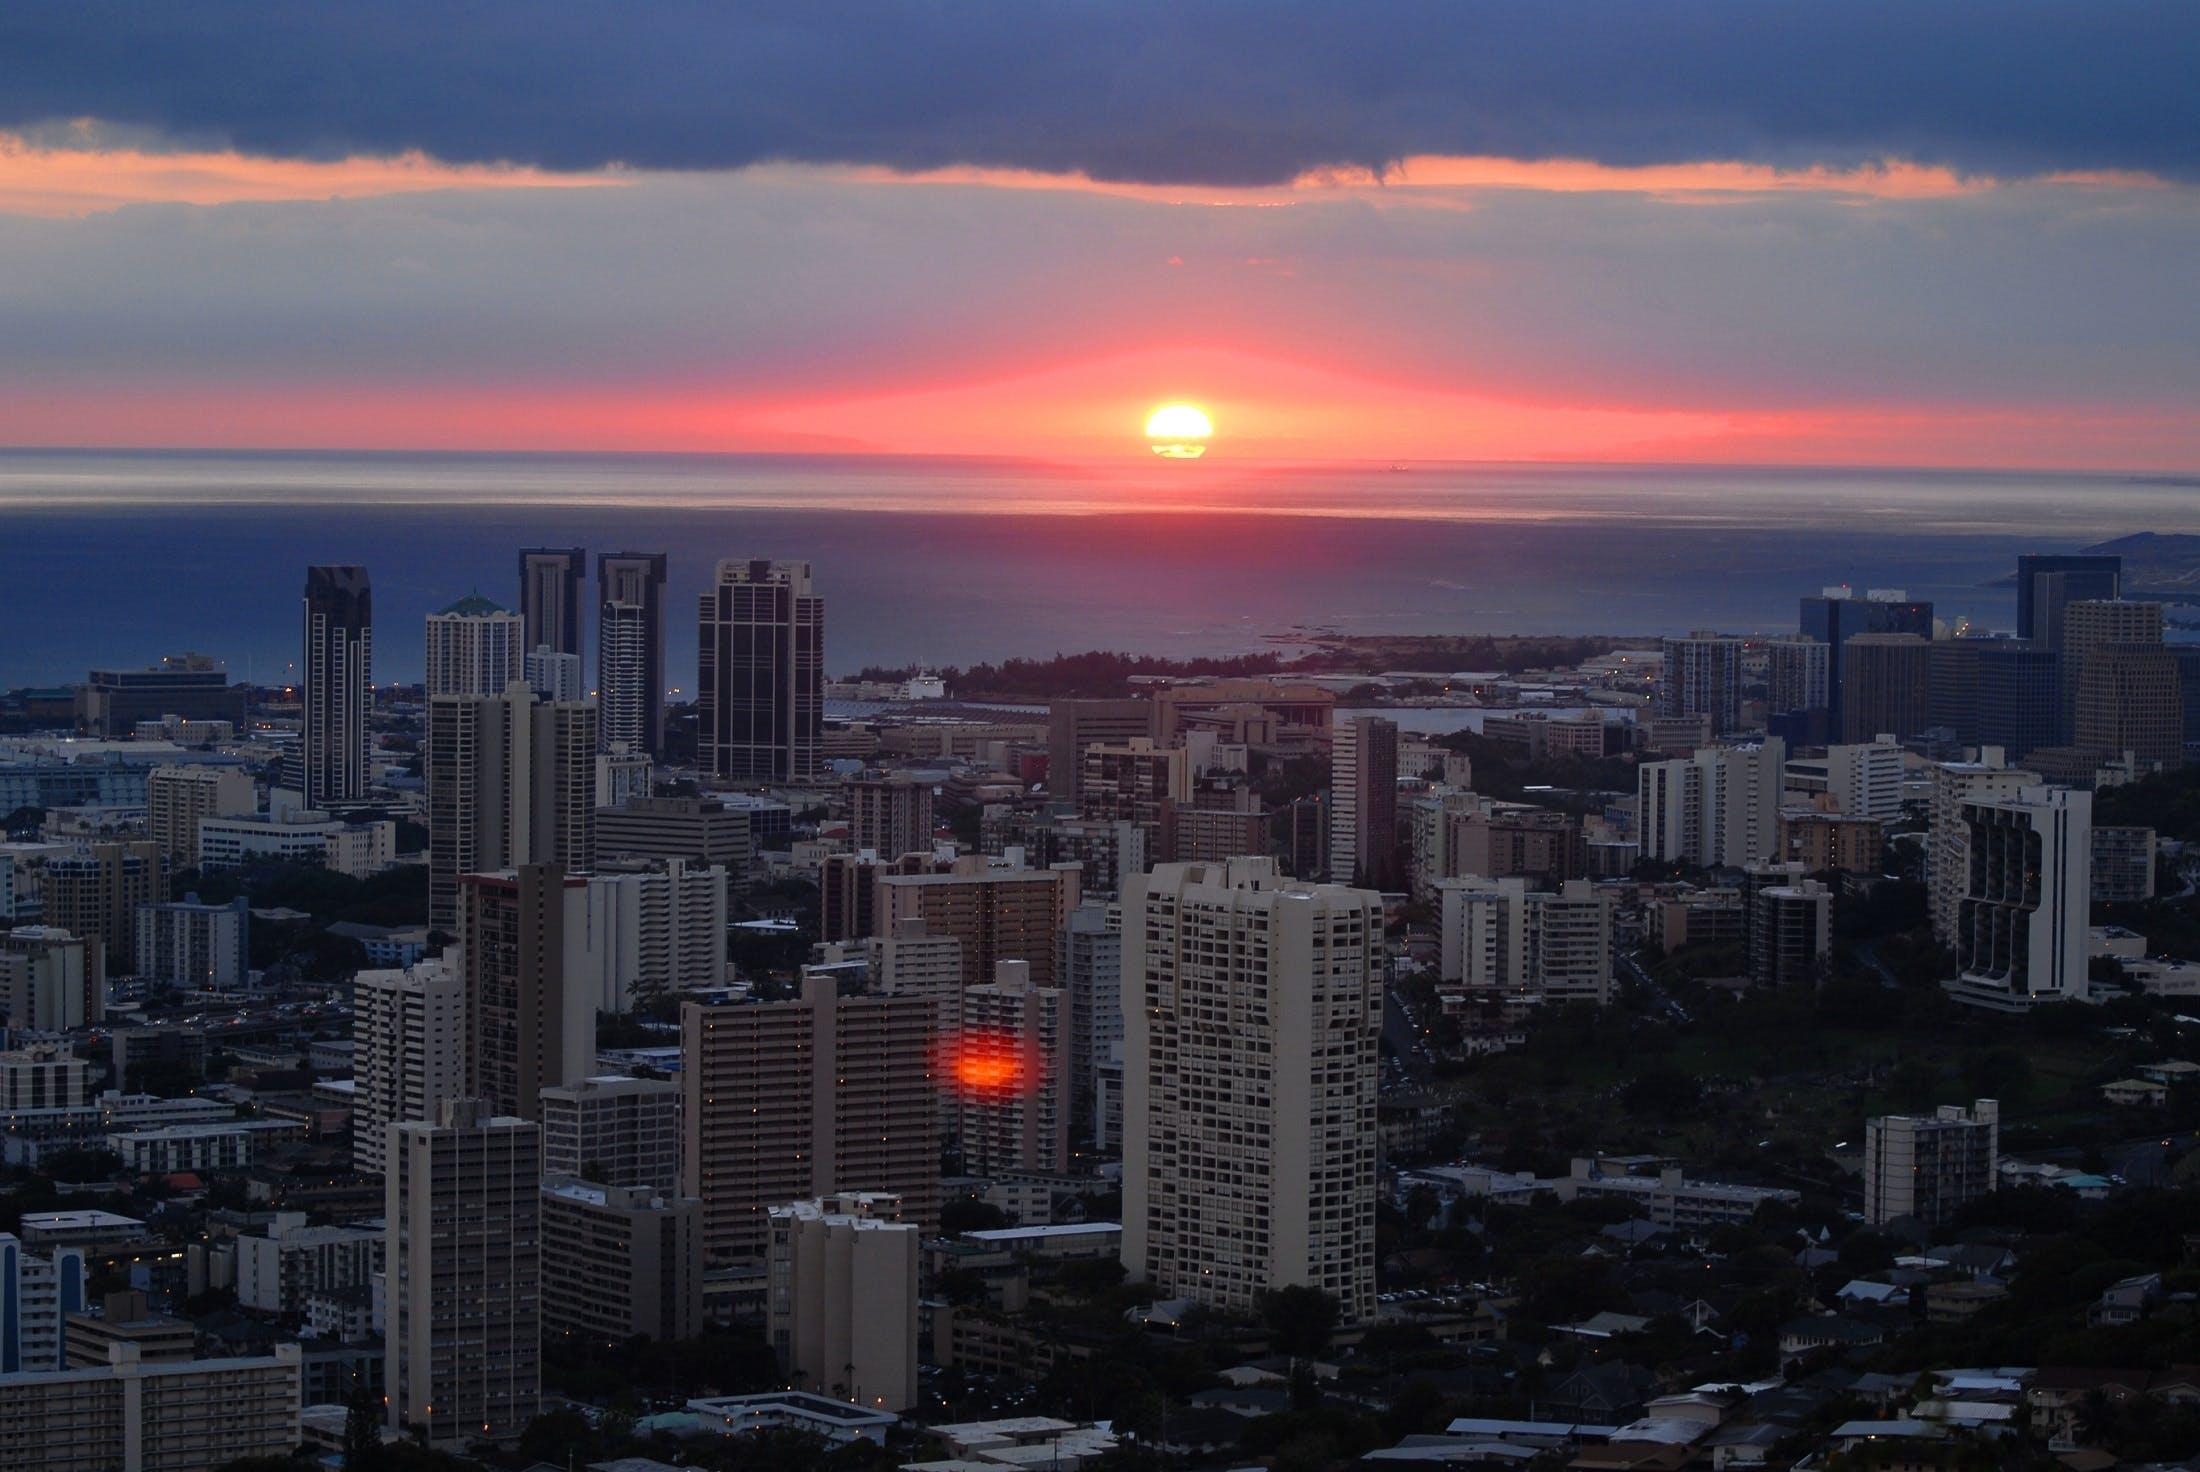 Free stock photo of city, dawn, sky, sunset